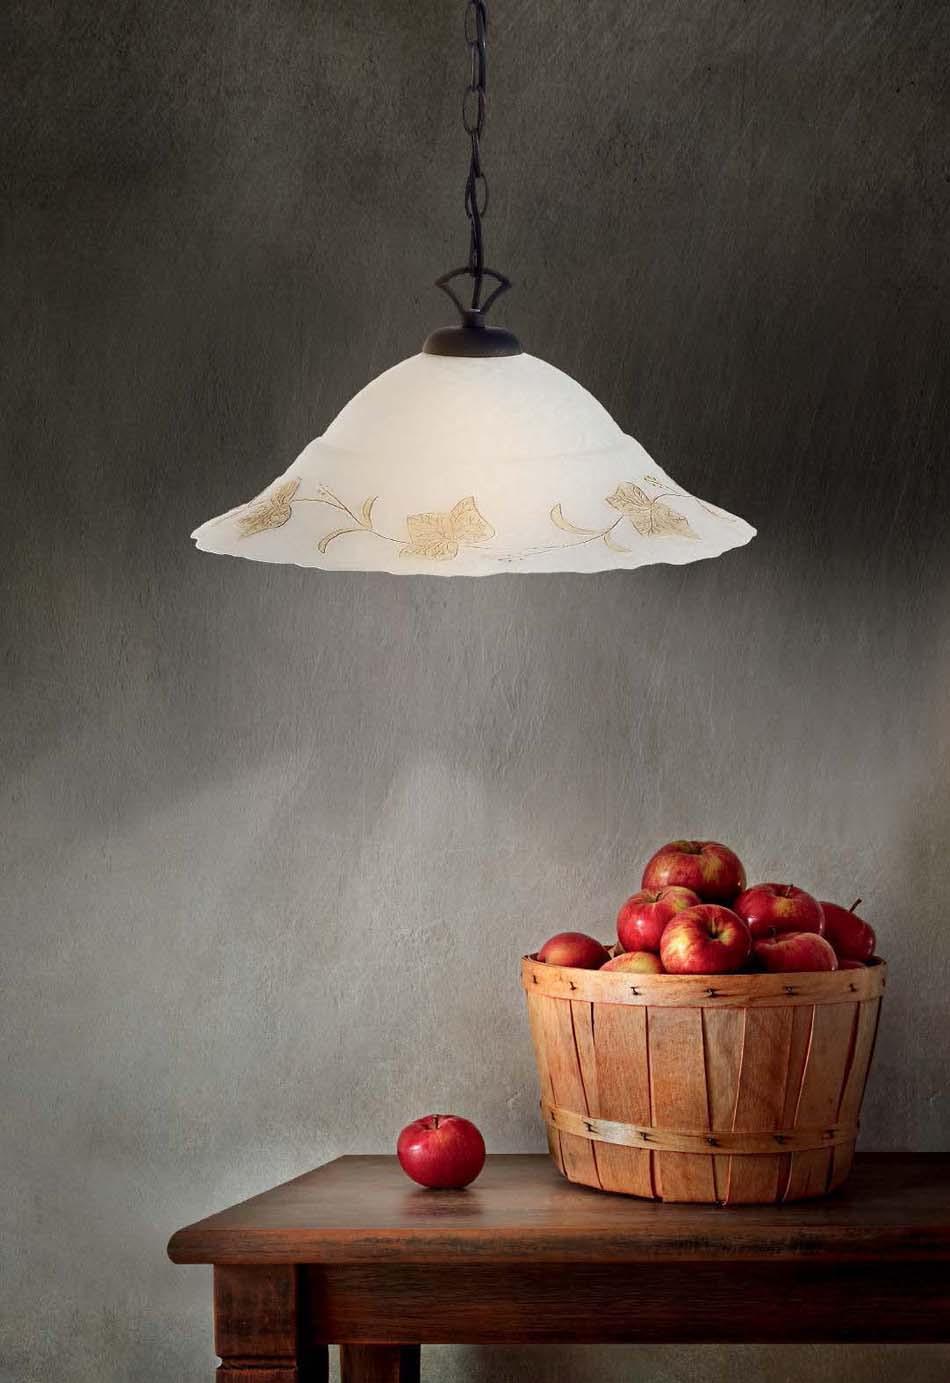 Lampade 52 sospese vintage Ideal Lux Foglia – Toscana Arredamenti